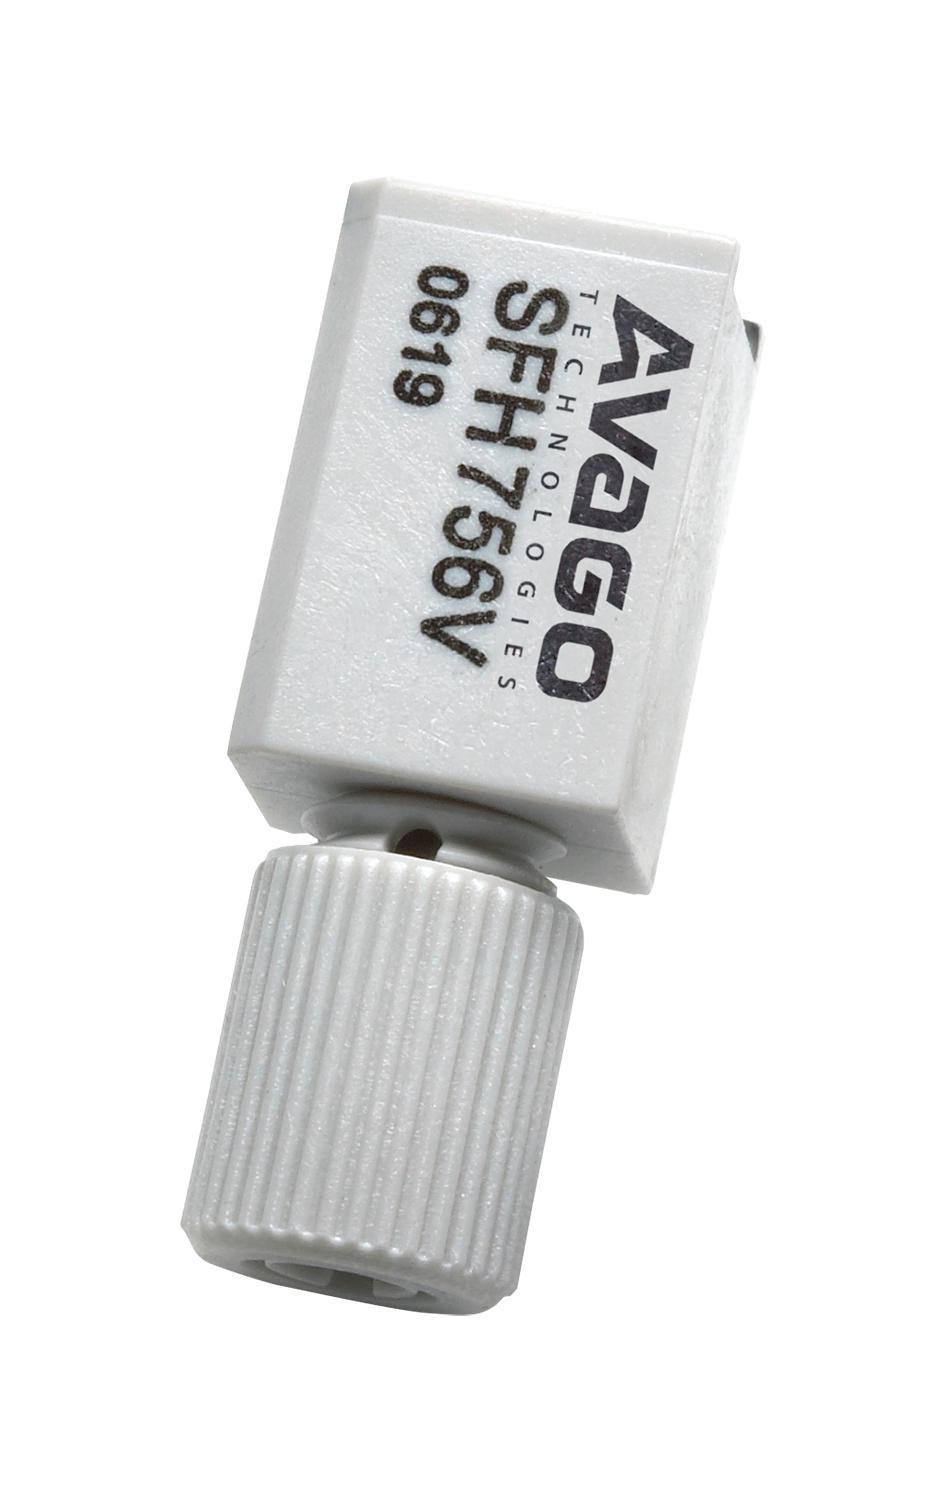 BROADCOM LIMITED, SP000063814, Fiber Optic Transmitter, 650 nm, 20 m, 50 mA, 2.1 V